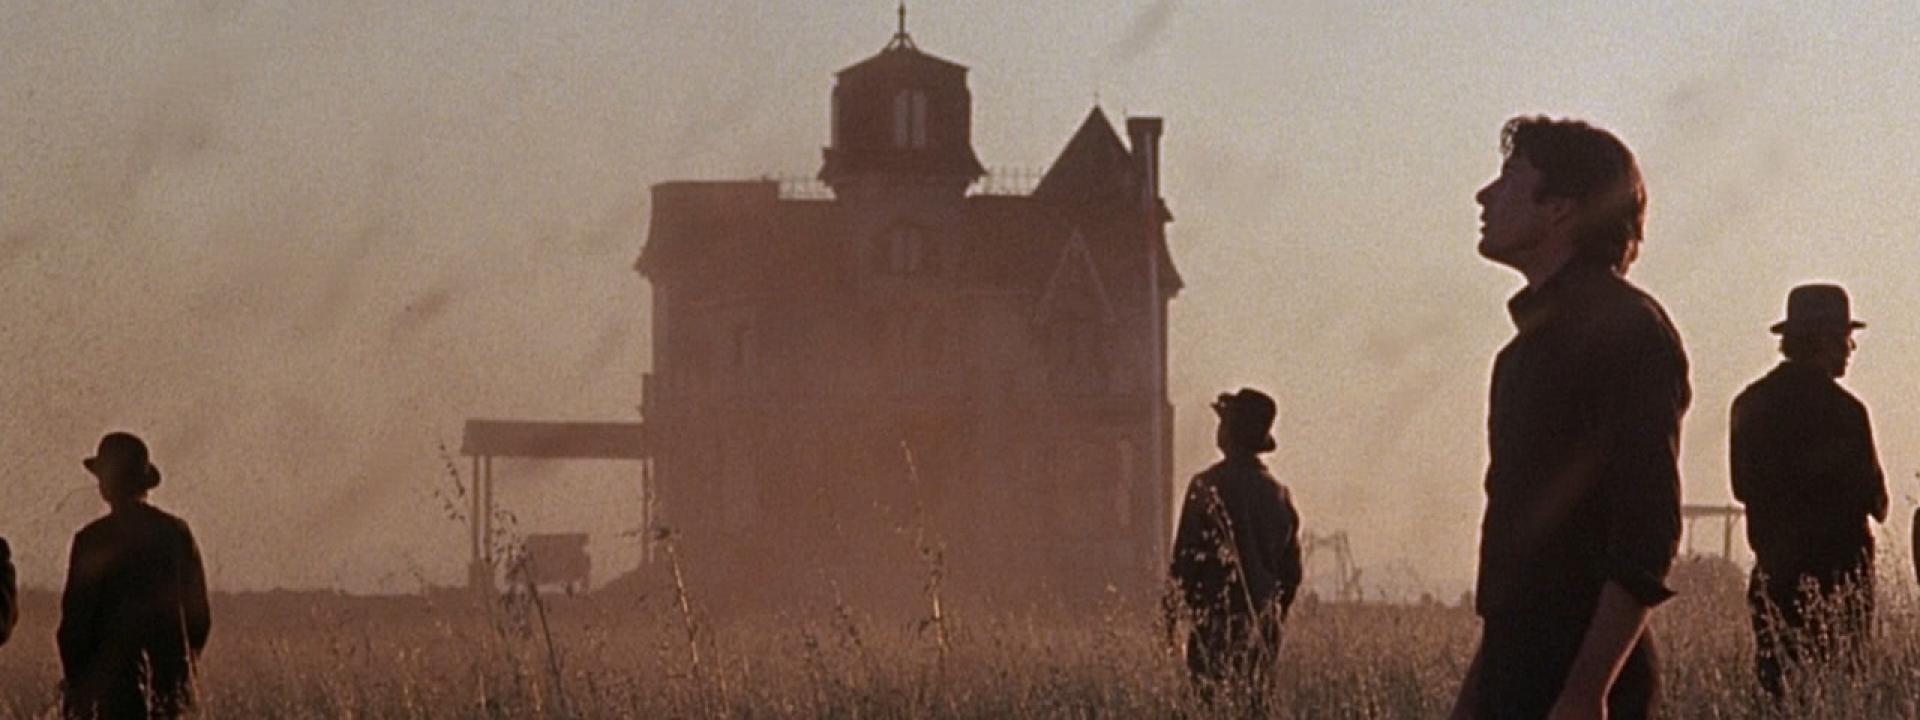 A Tribute to Εnnio Morricone: Days of Heaven (1978) - Εικόνα